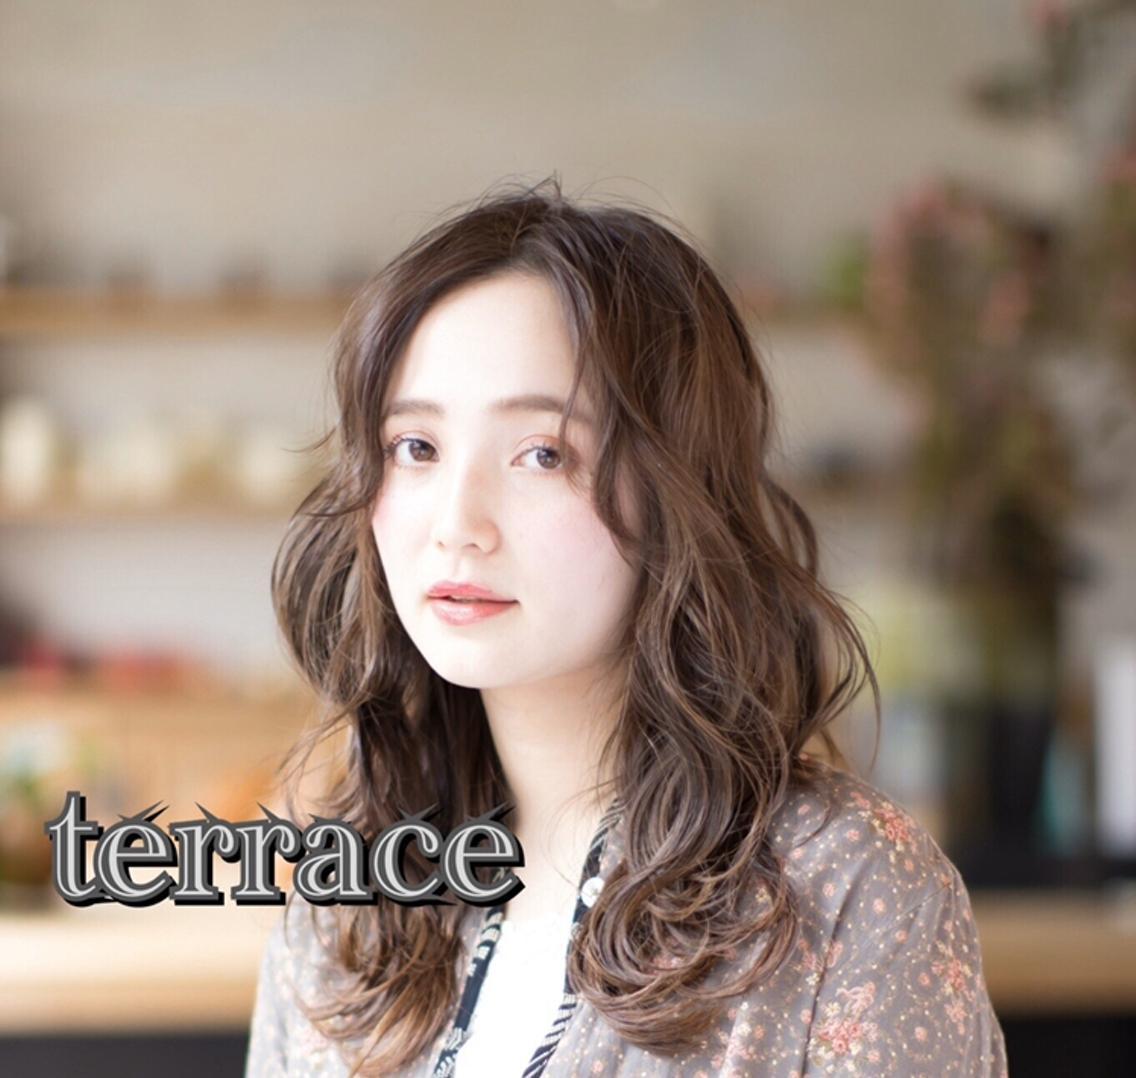 銀座terrace所属・stylist黒崎の掲載